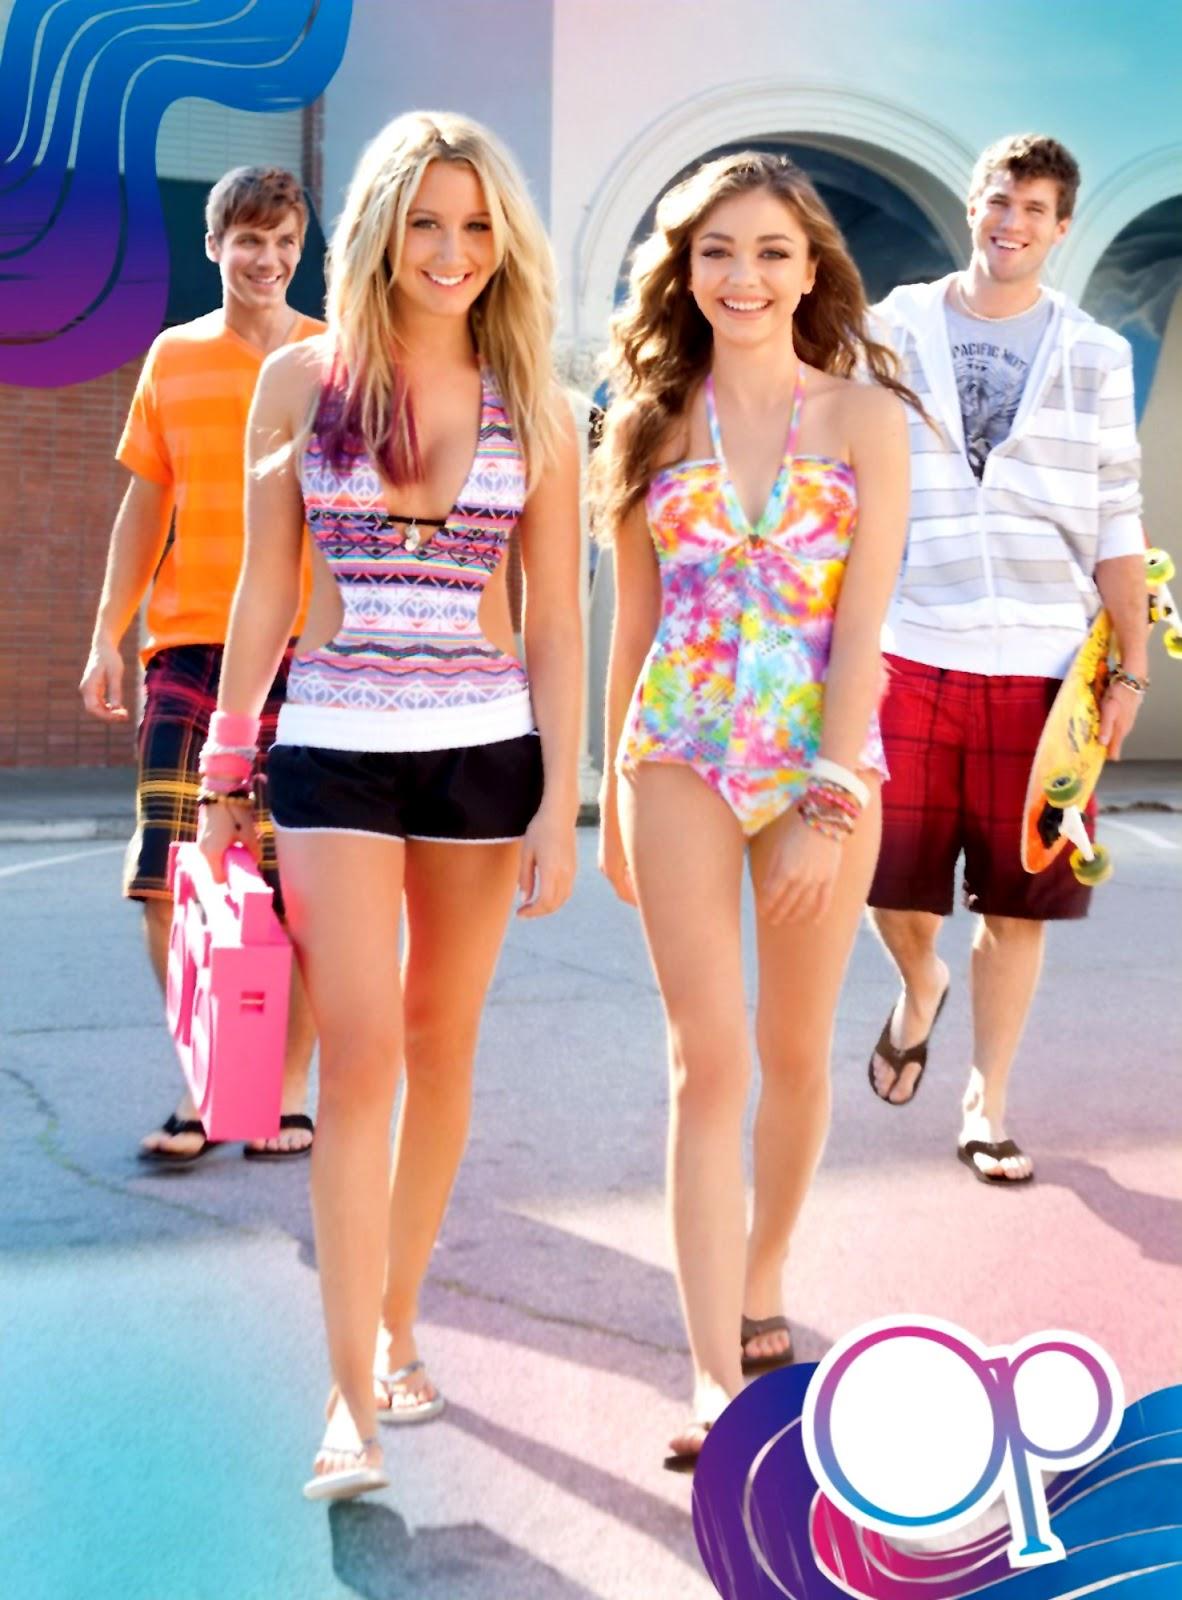 http://3.bp.blogspot.com/-G47zrYGPu3I/T8Q-HmqDVXI/AAAAAAAABO8/GdemItZVWfs/s1600/Ashley-Tisdale-and-Sarah-Hyland-Op-Spring-Summer-2012-Campaign-Photo-1.jpg